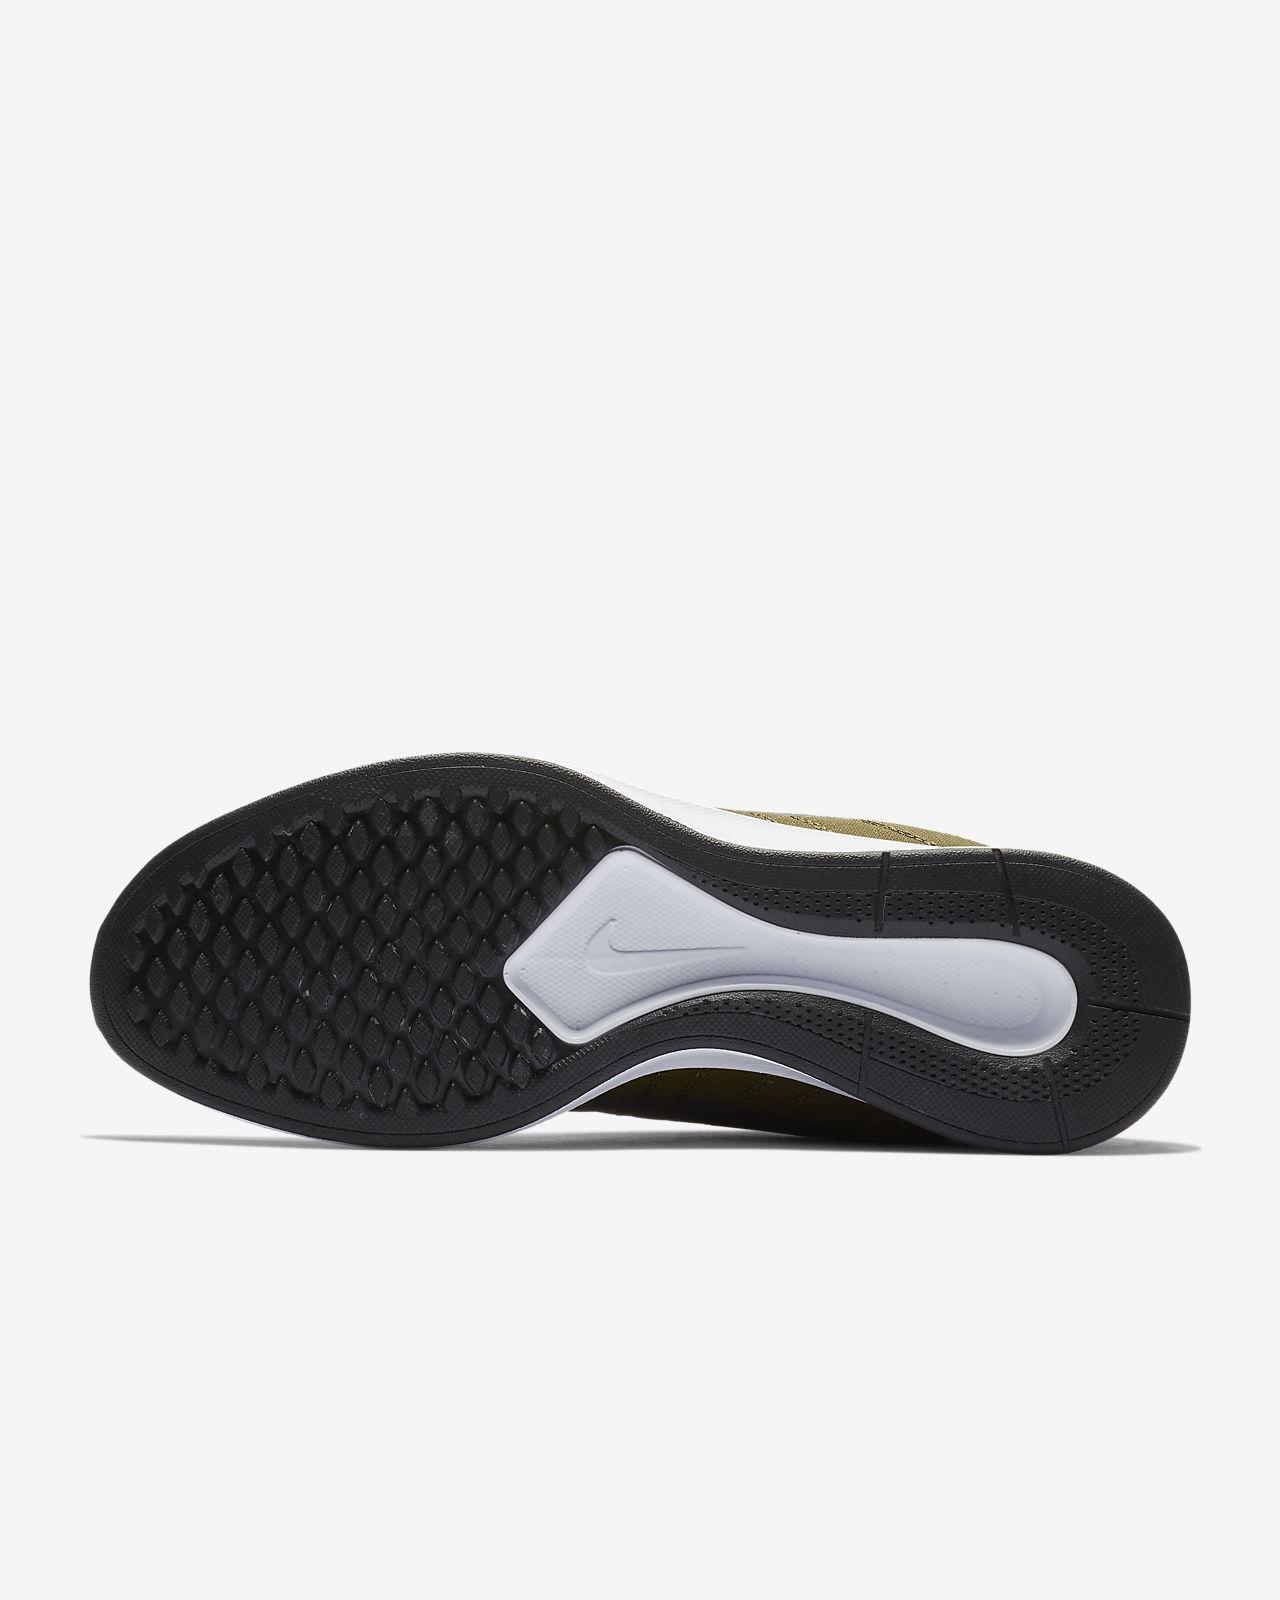 bc578746b77f Nike Dualtone Racer Men s Shoe. Nike.com AU